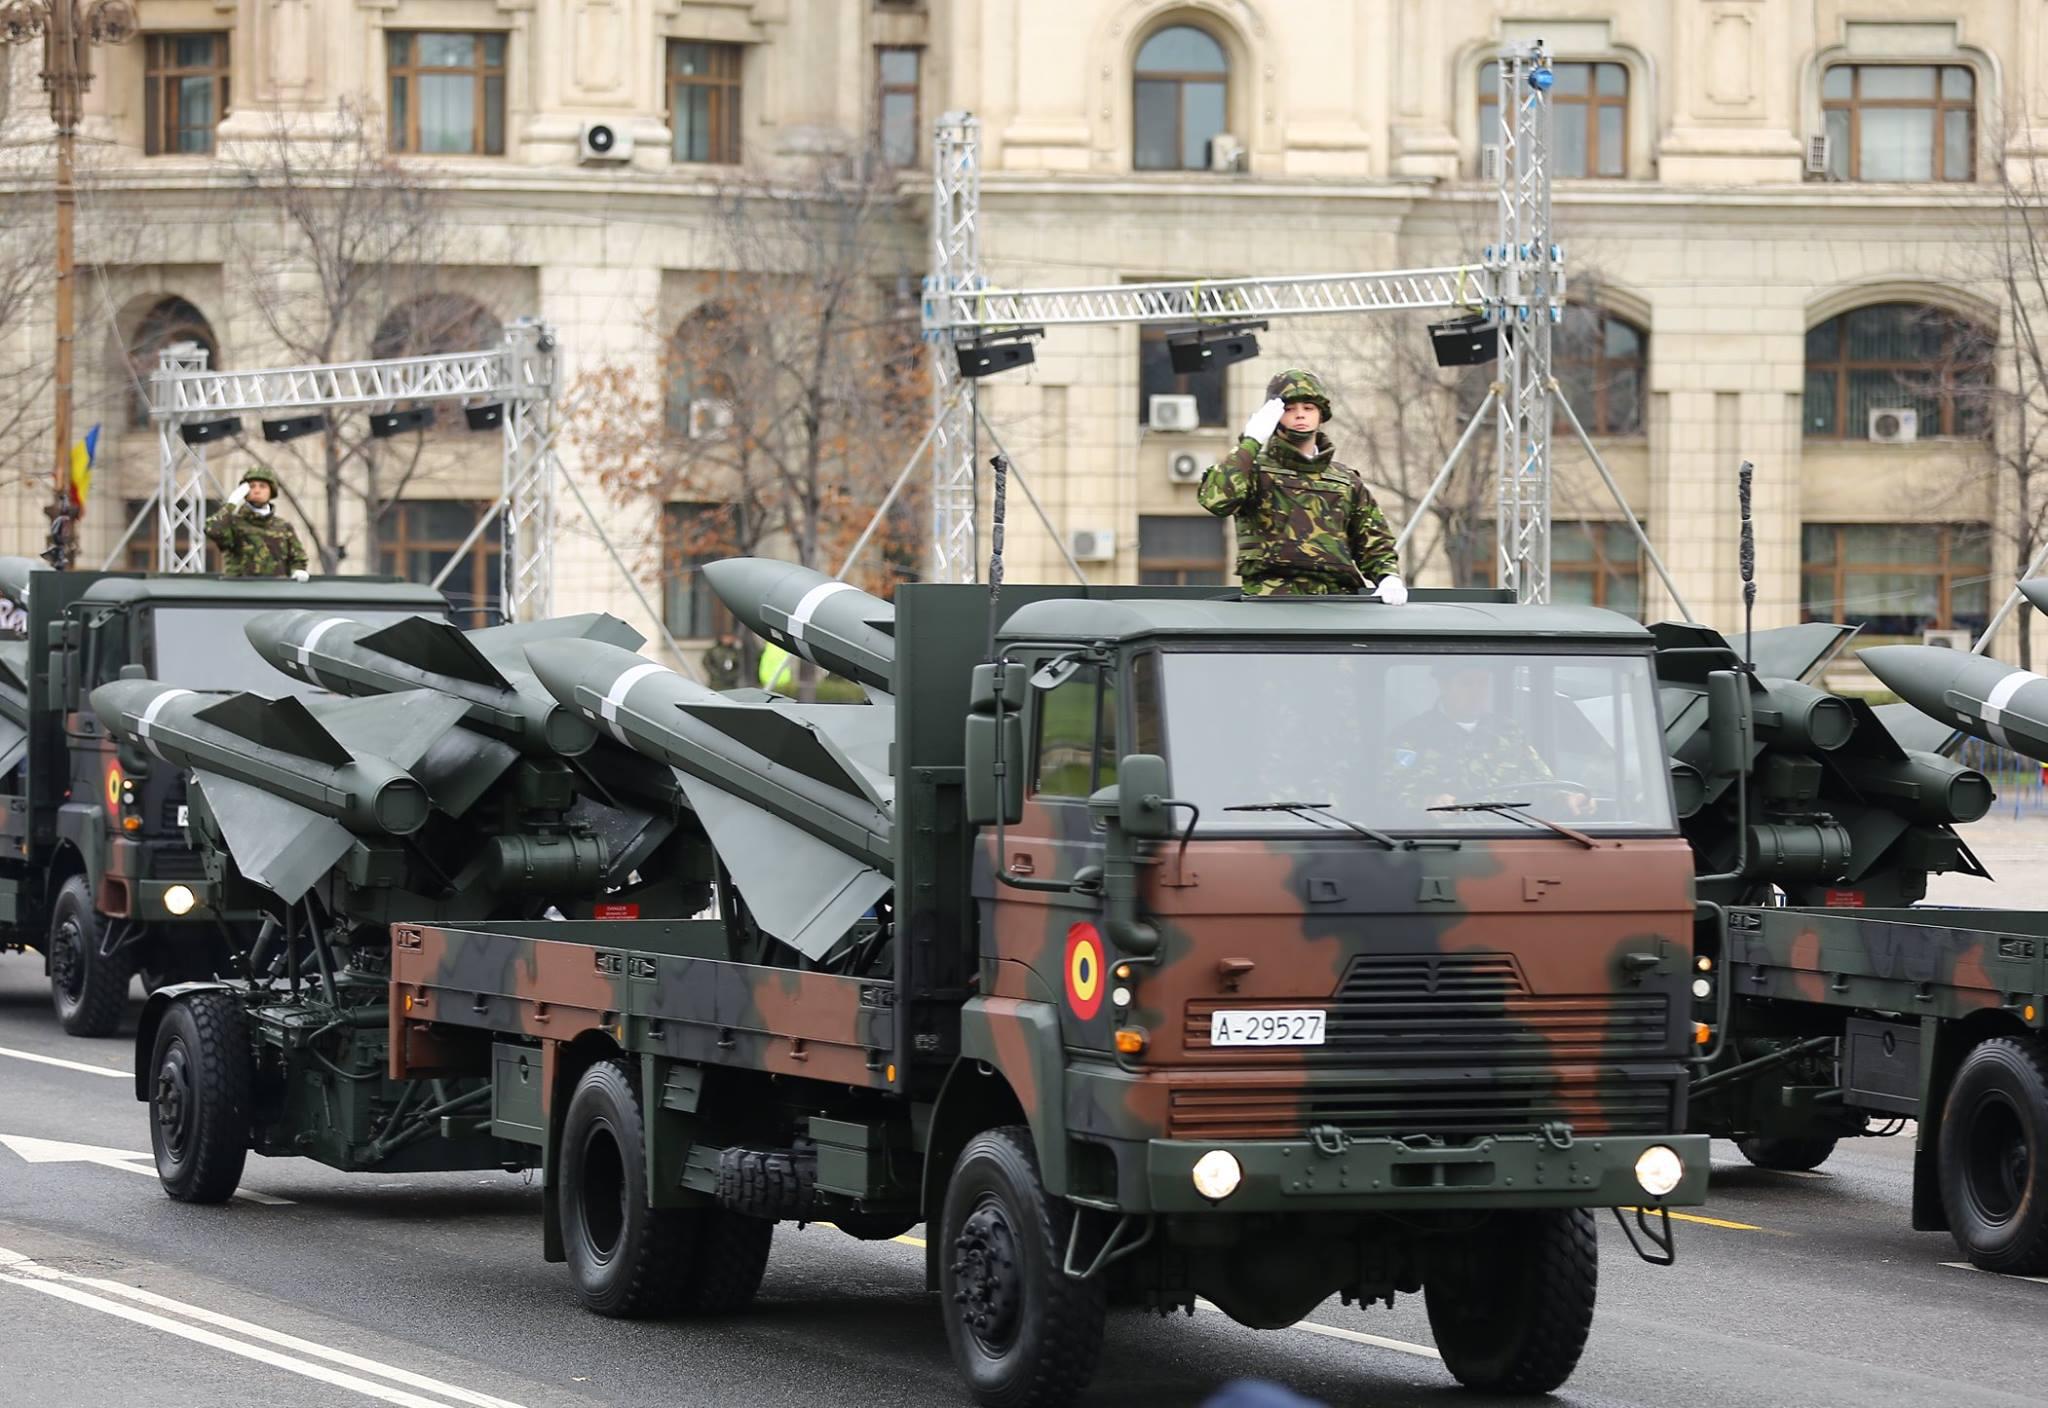 Repetitii parada militara 1 decembrie. Foto - MApN 17